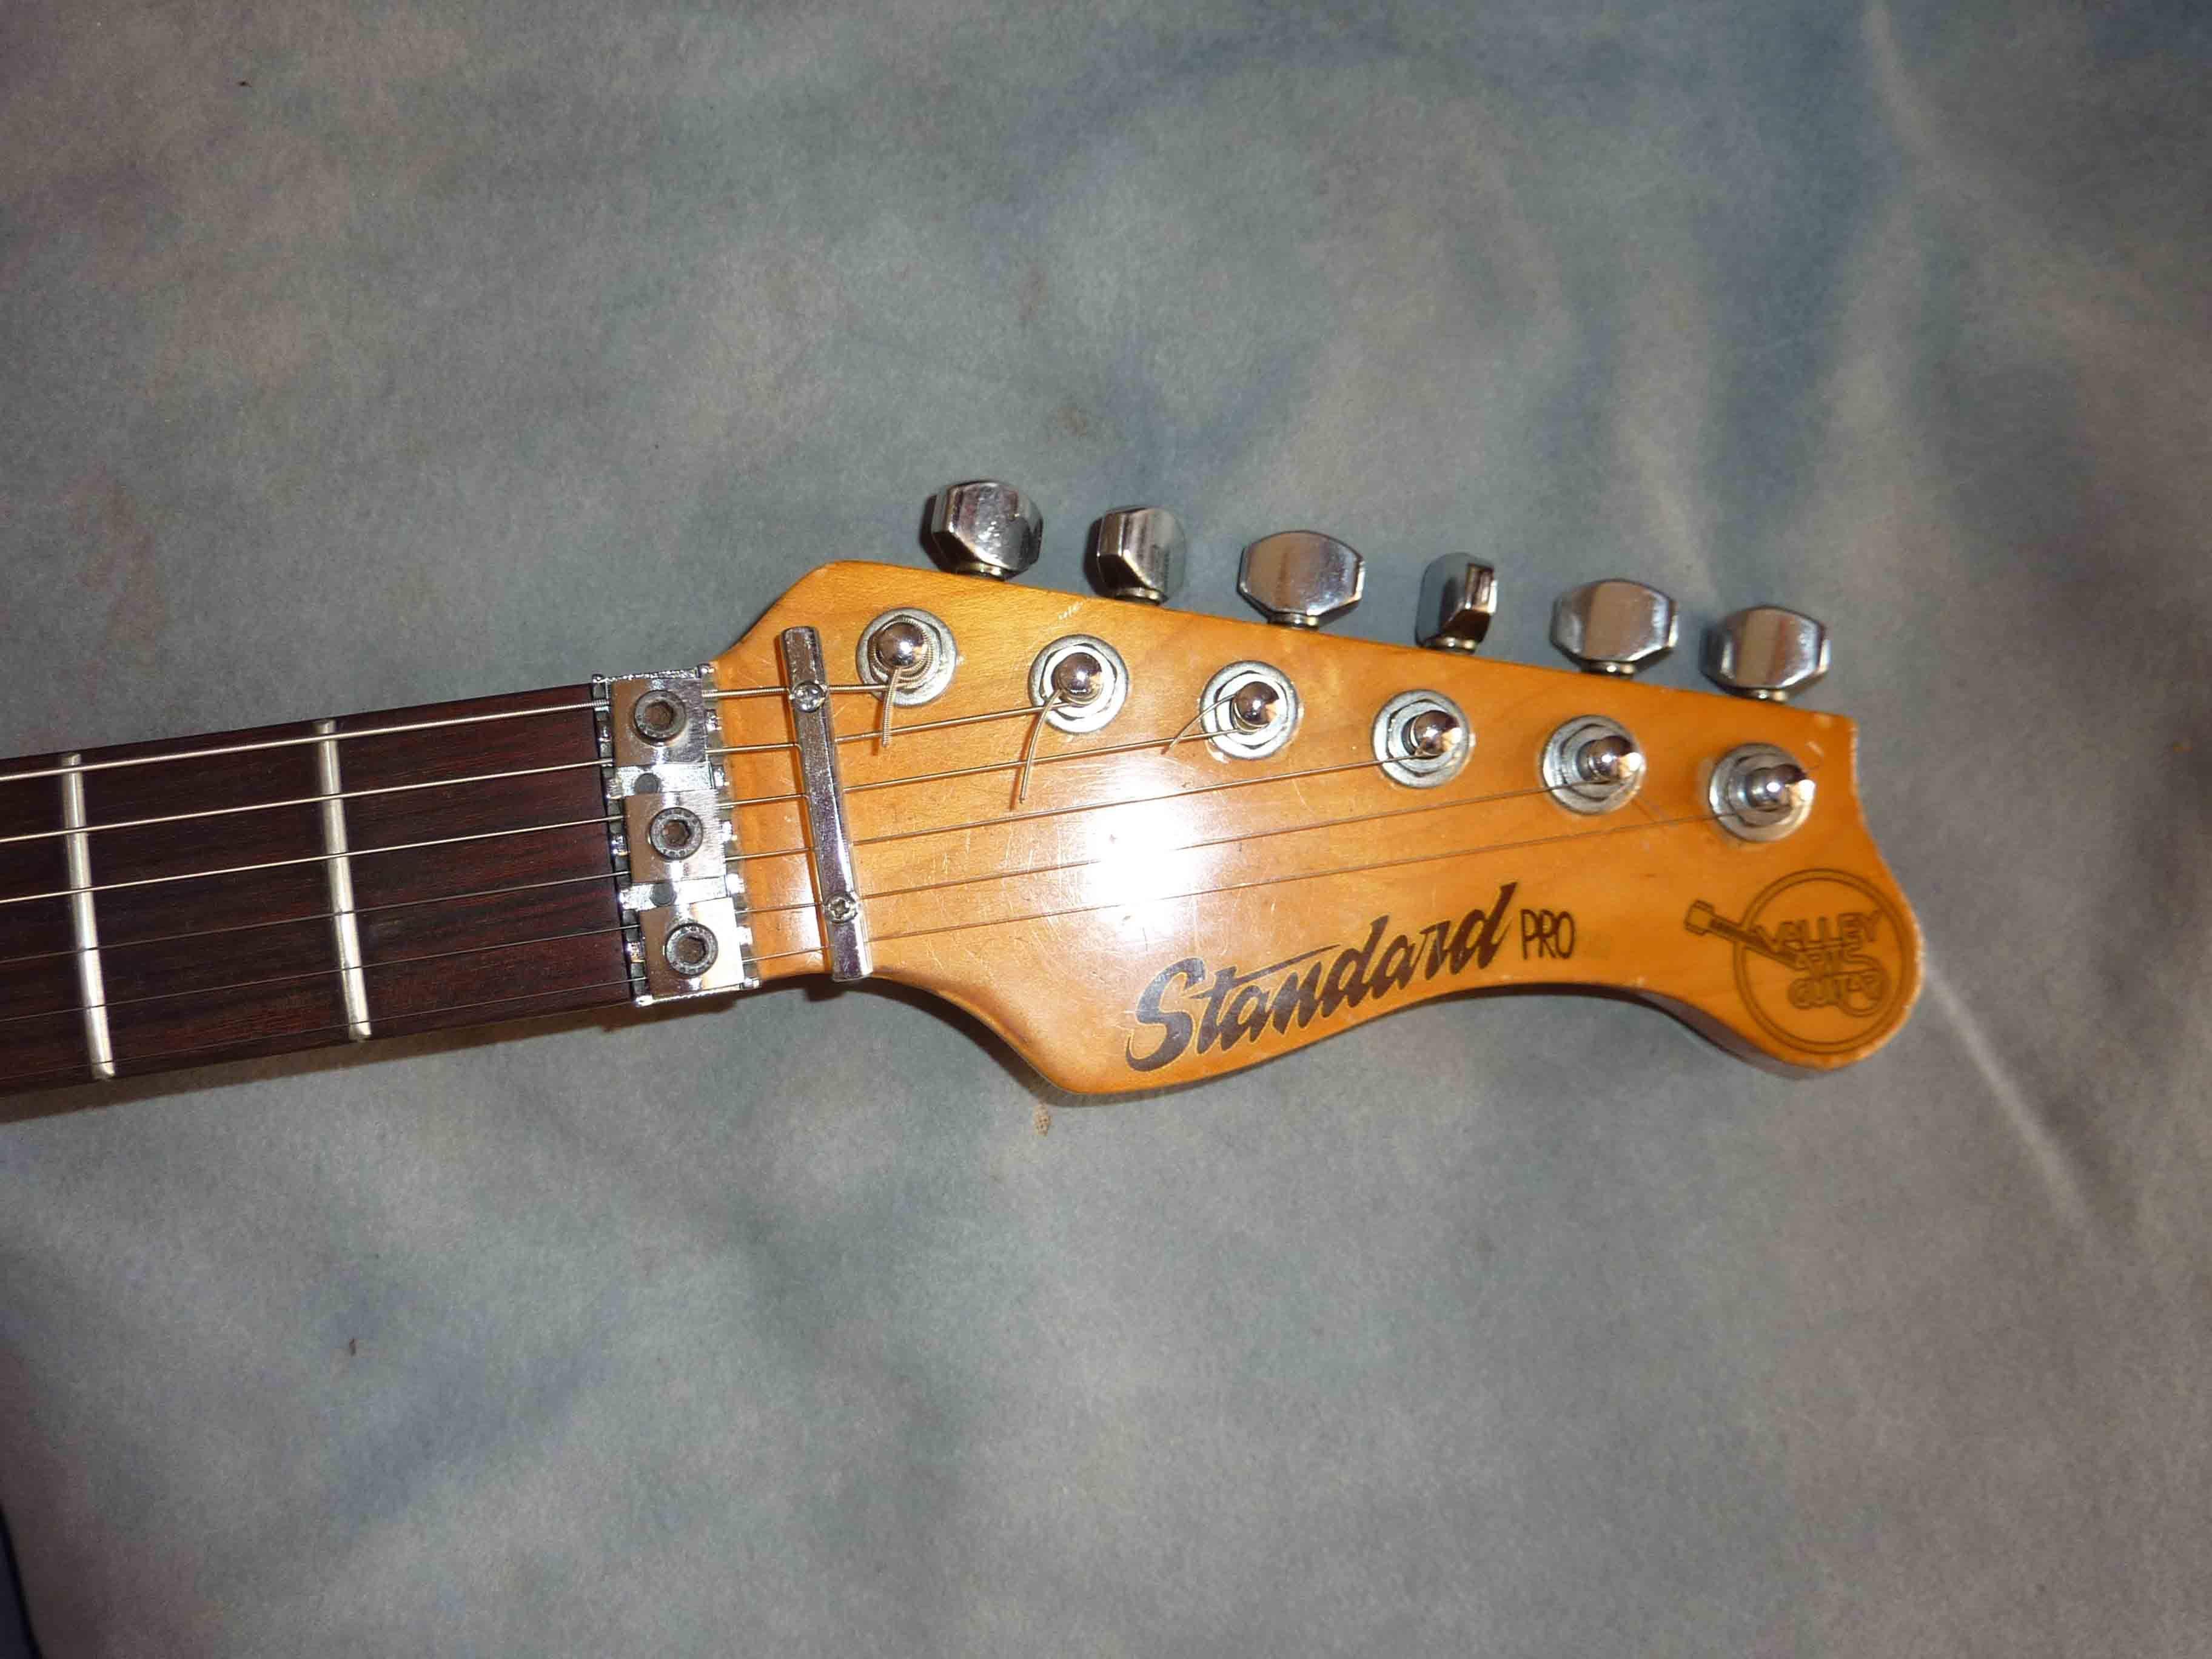 valley arts guitars standard pro image 84282 audiofanzine. Black Bedroom Furniture Sets. Home Design Ideas